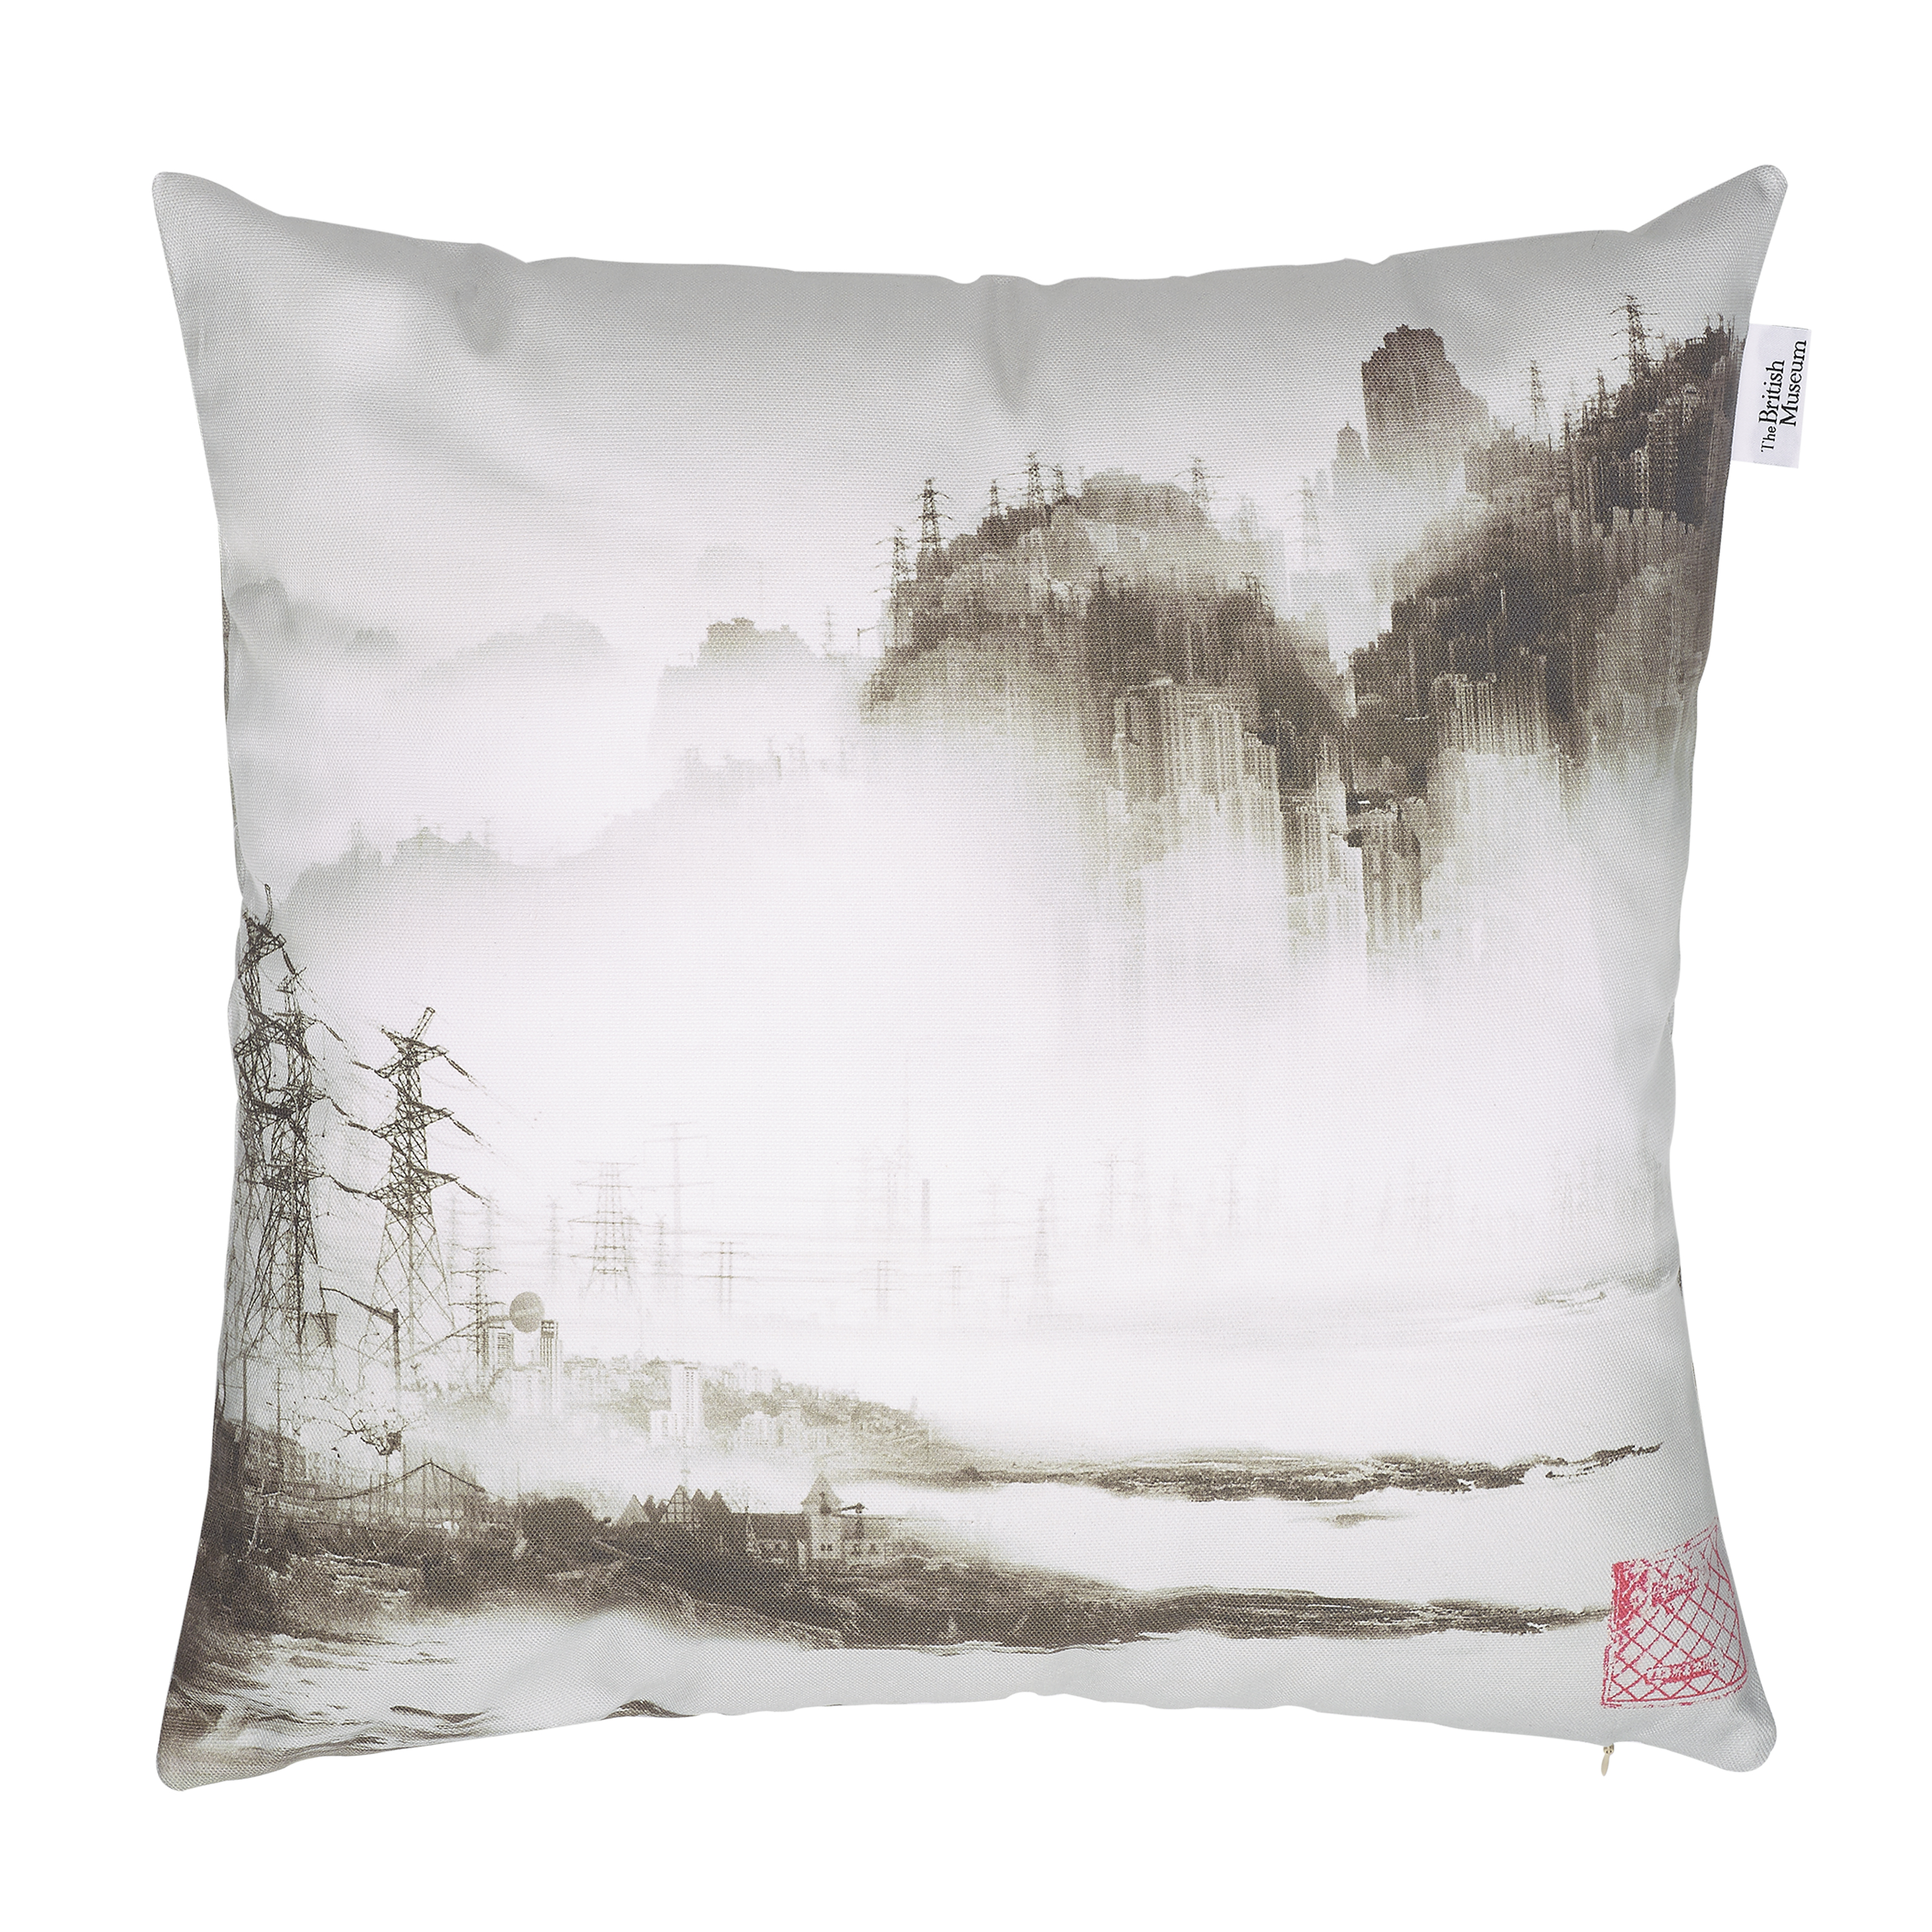 Phantom landscape cushion cover